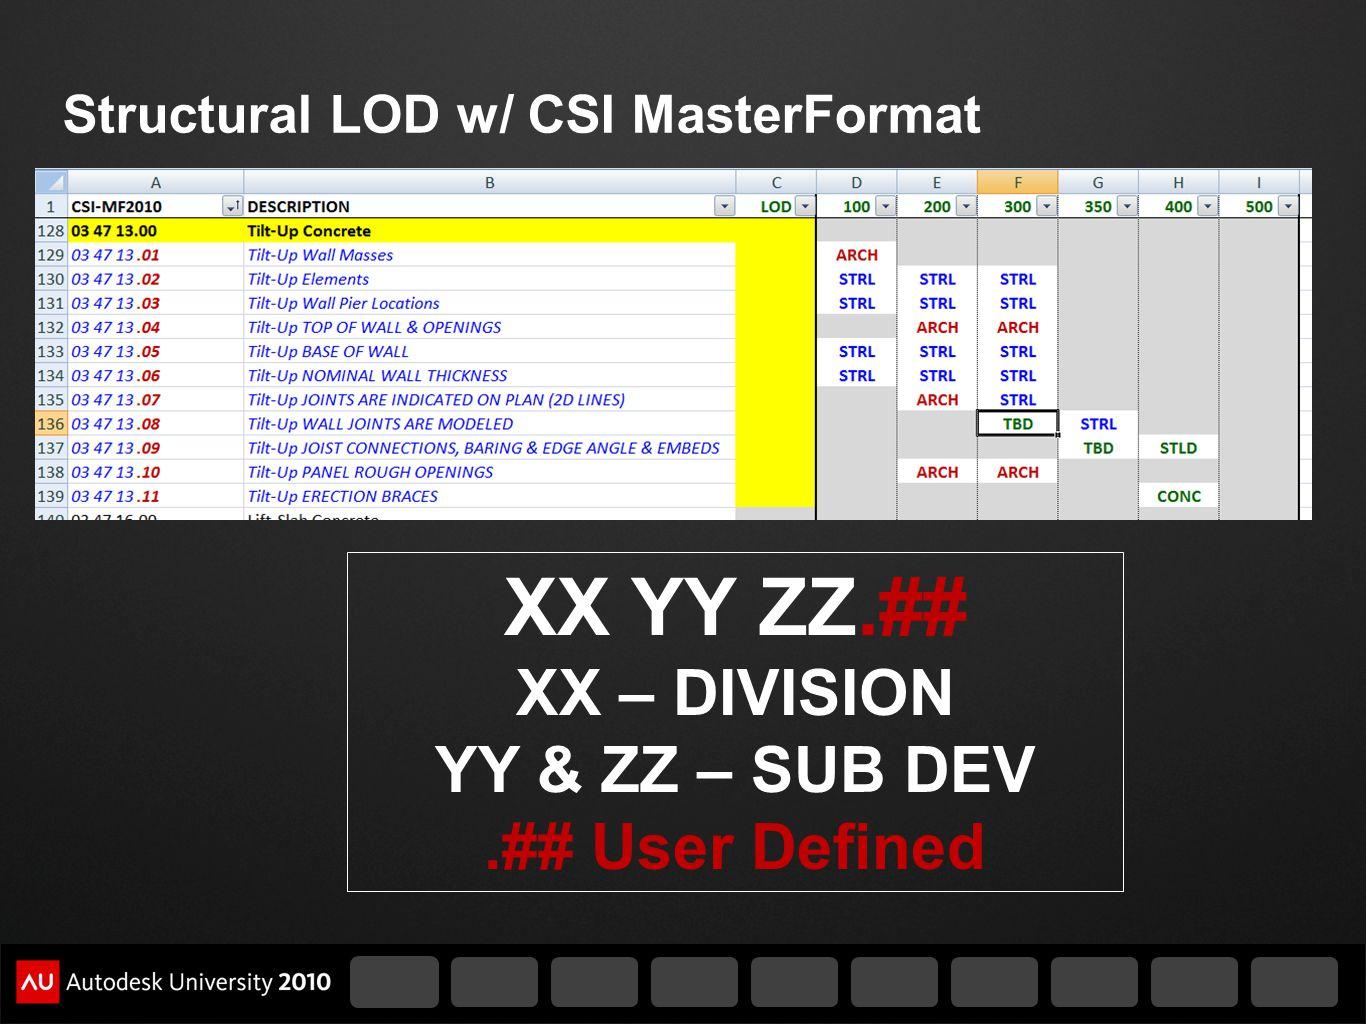 Structural LOD w/ CSI MasterFormat XX YY ZZ.## XX – DIVISION YY & ZZ – SUB DEV.## User Defined